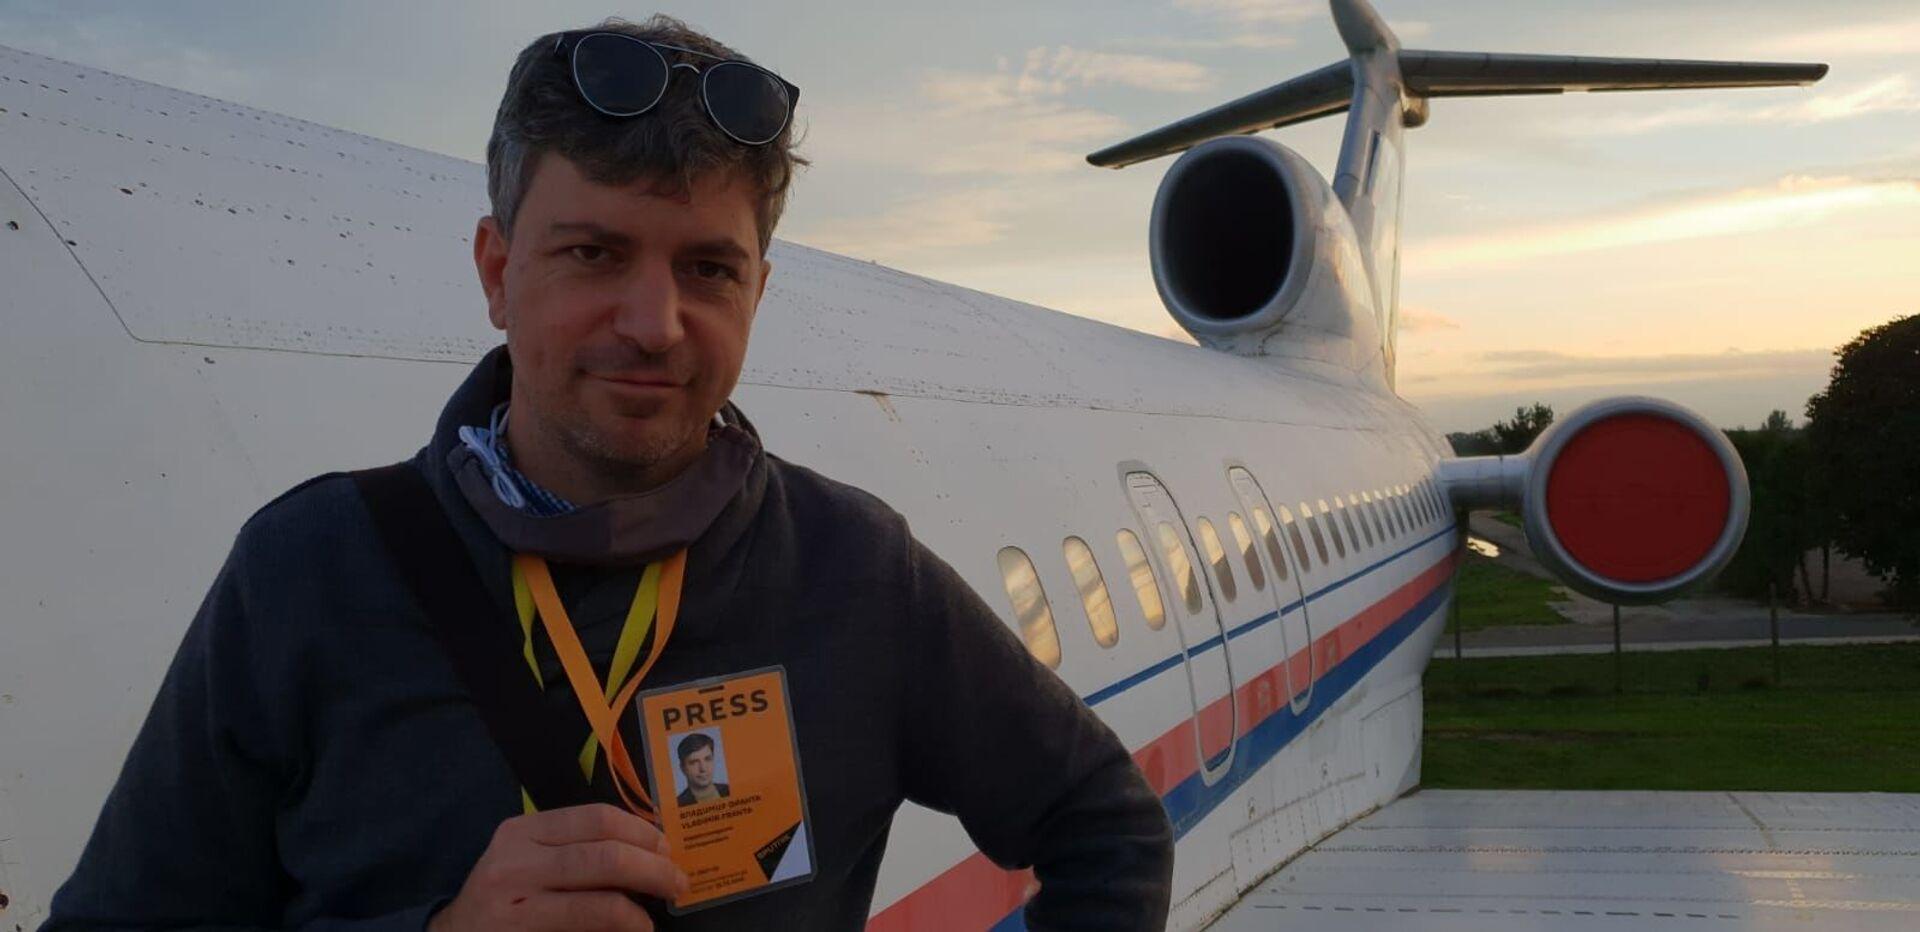 Reportér Sputniku u Tupoleva TU-154M, které využívali prezidenti Václav Havel i Václav Klaus - Sputnik Česká republika, 1920, 20.04.2021